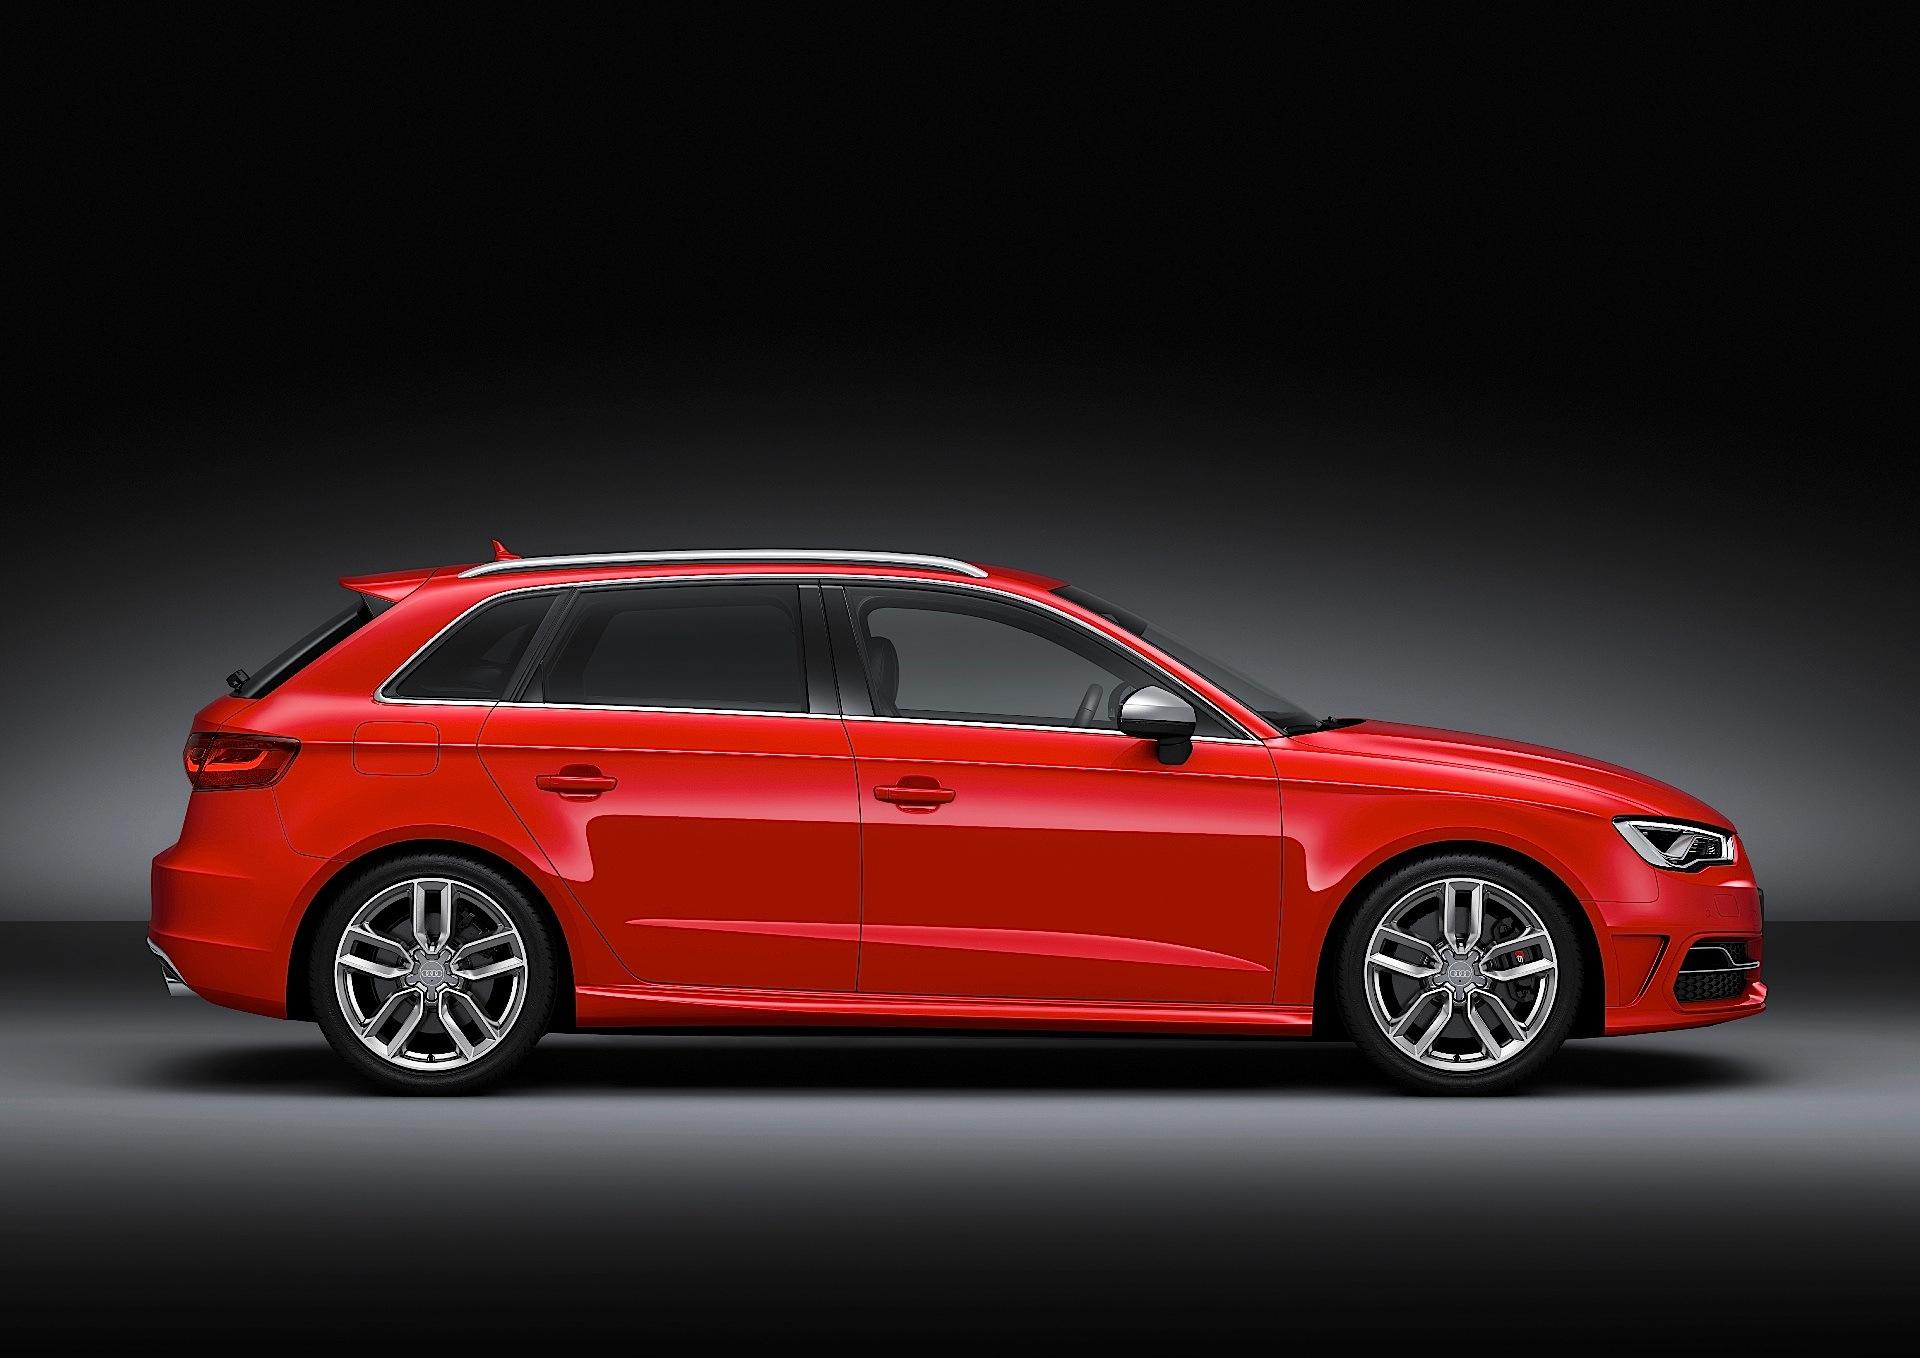 Kelebihan Kekurangan Audi S3 2014 Murah Berkualitas